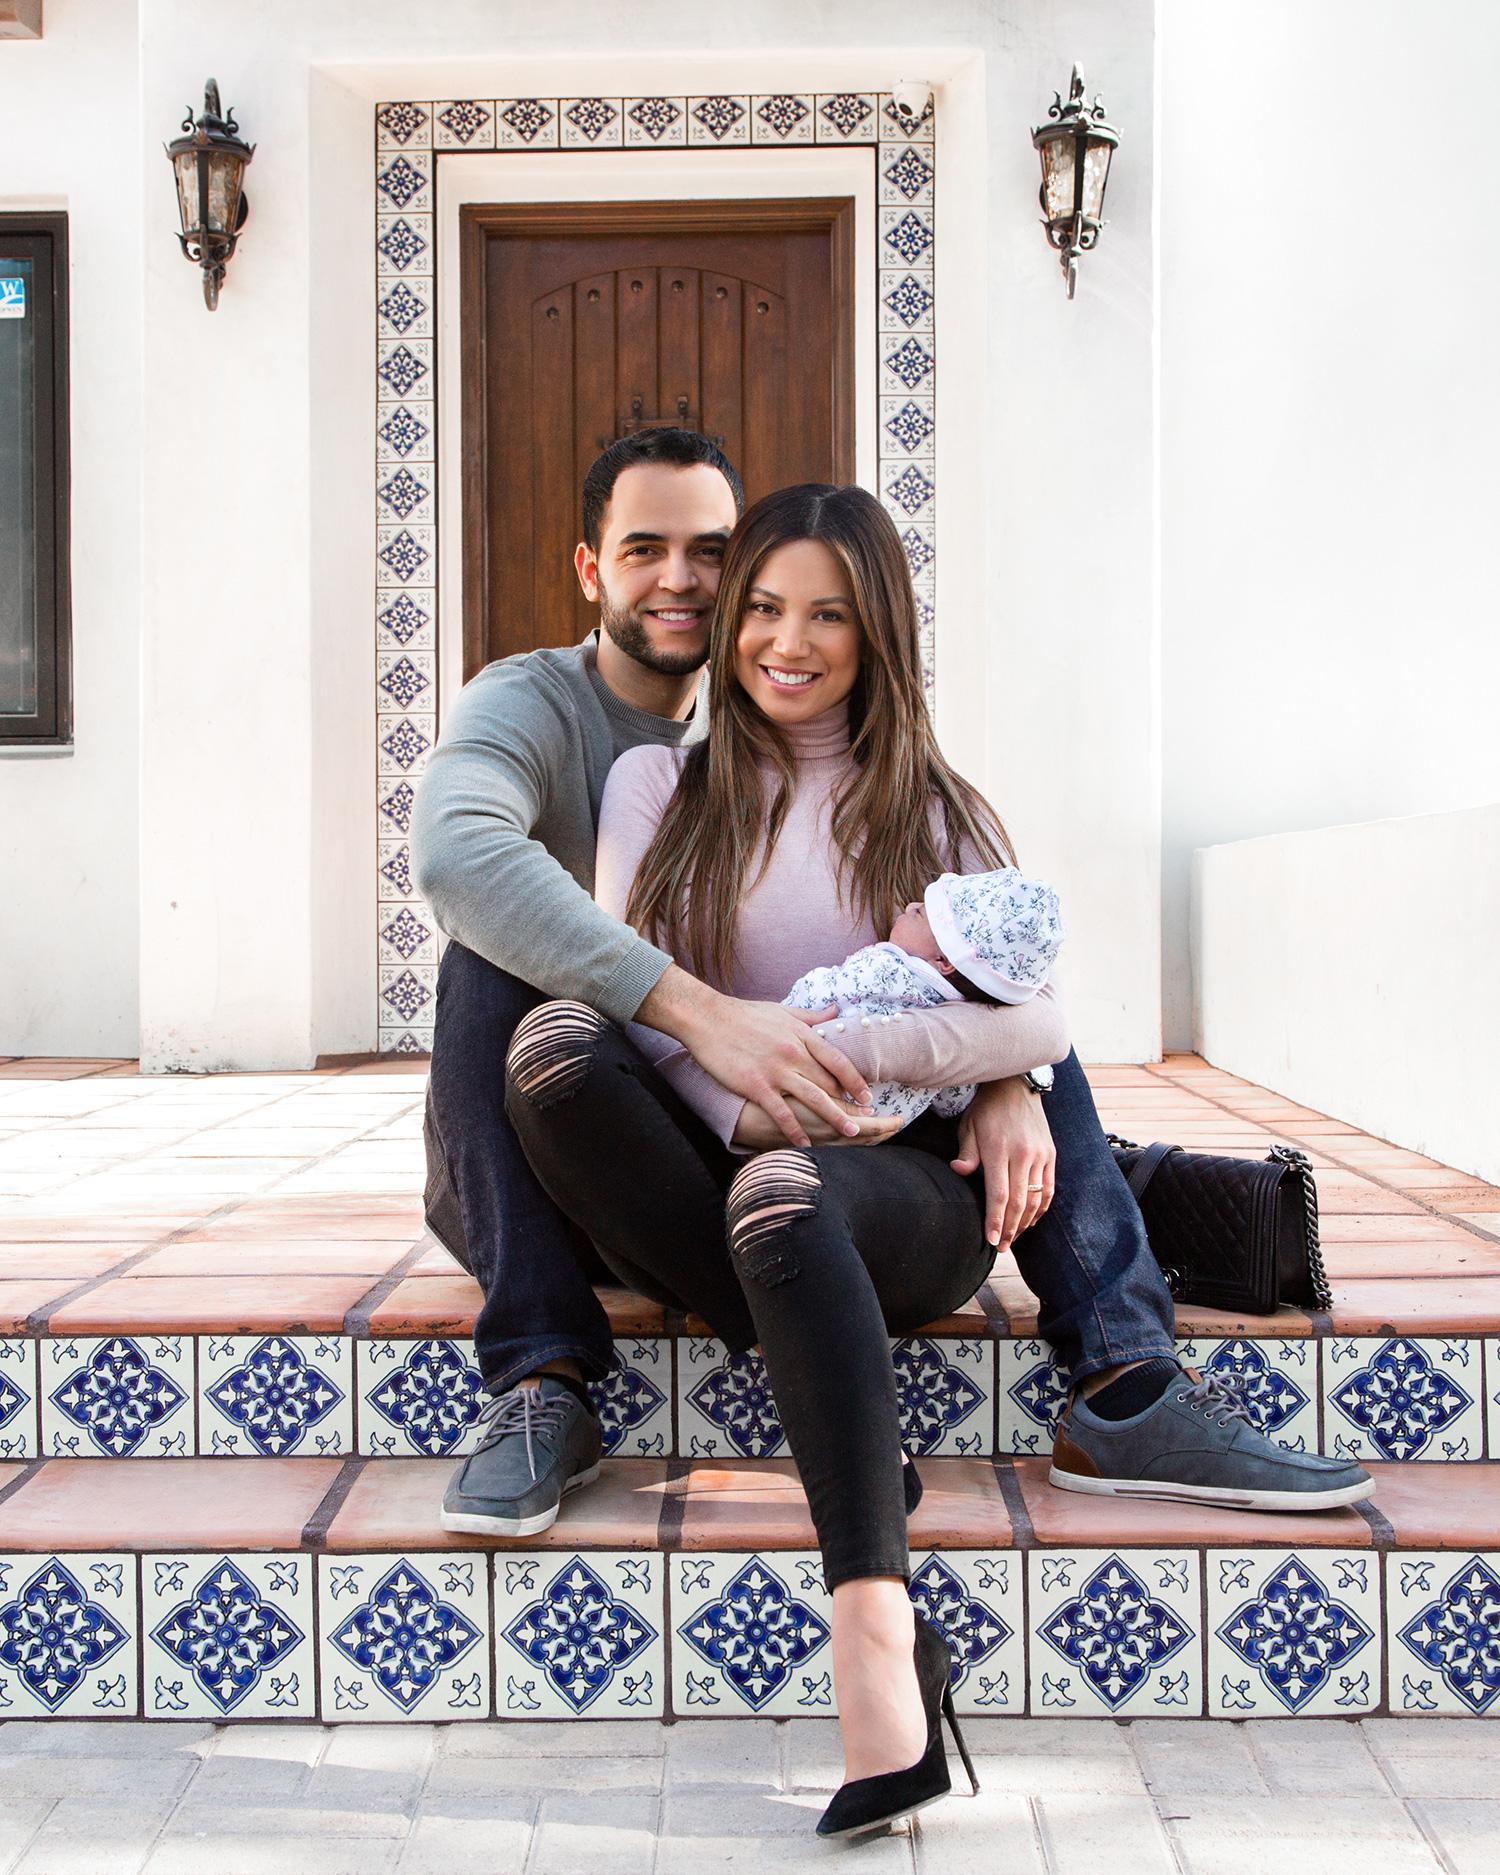 Jessi Malay's Husband and Baby